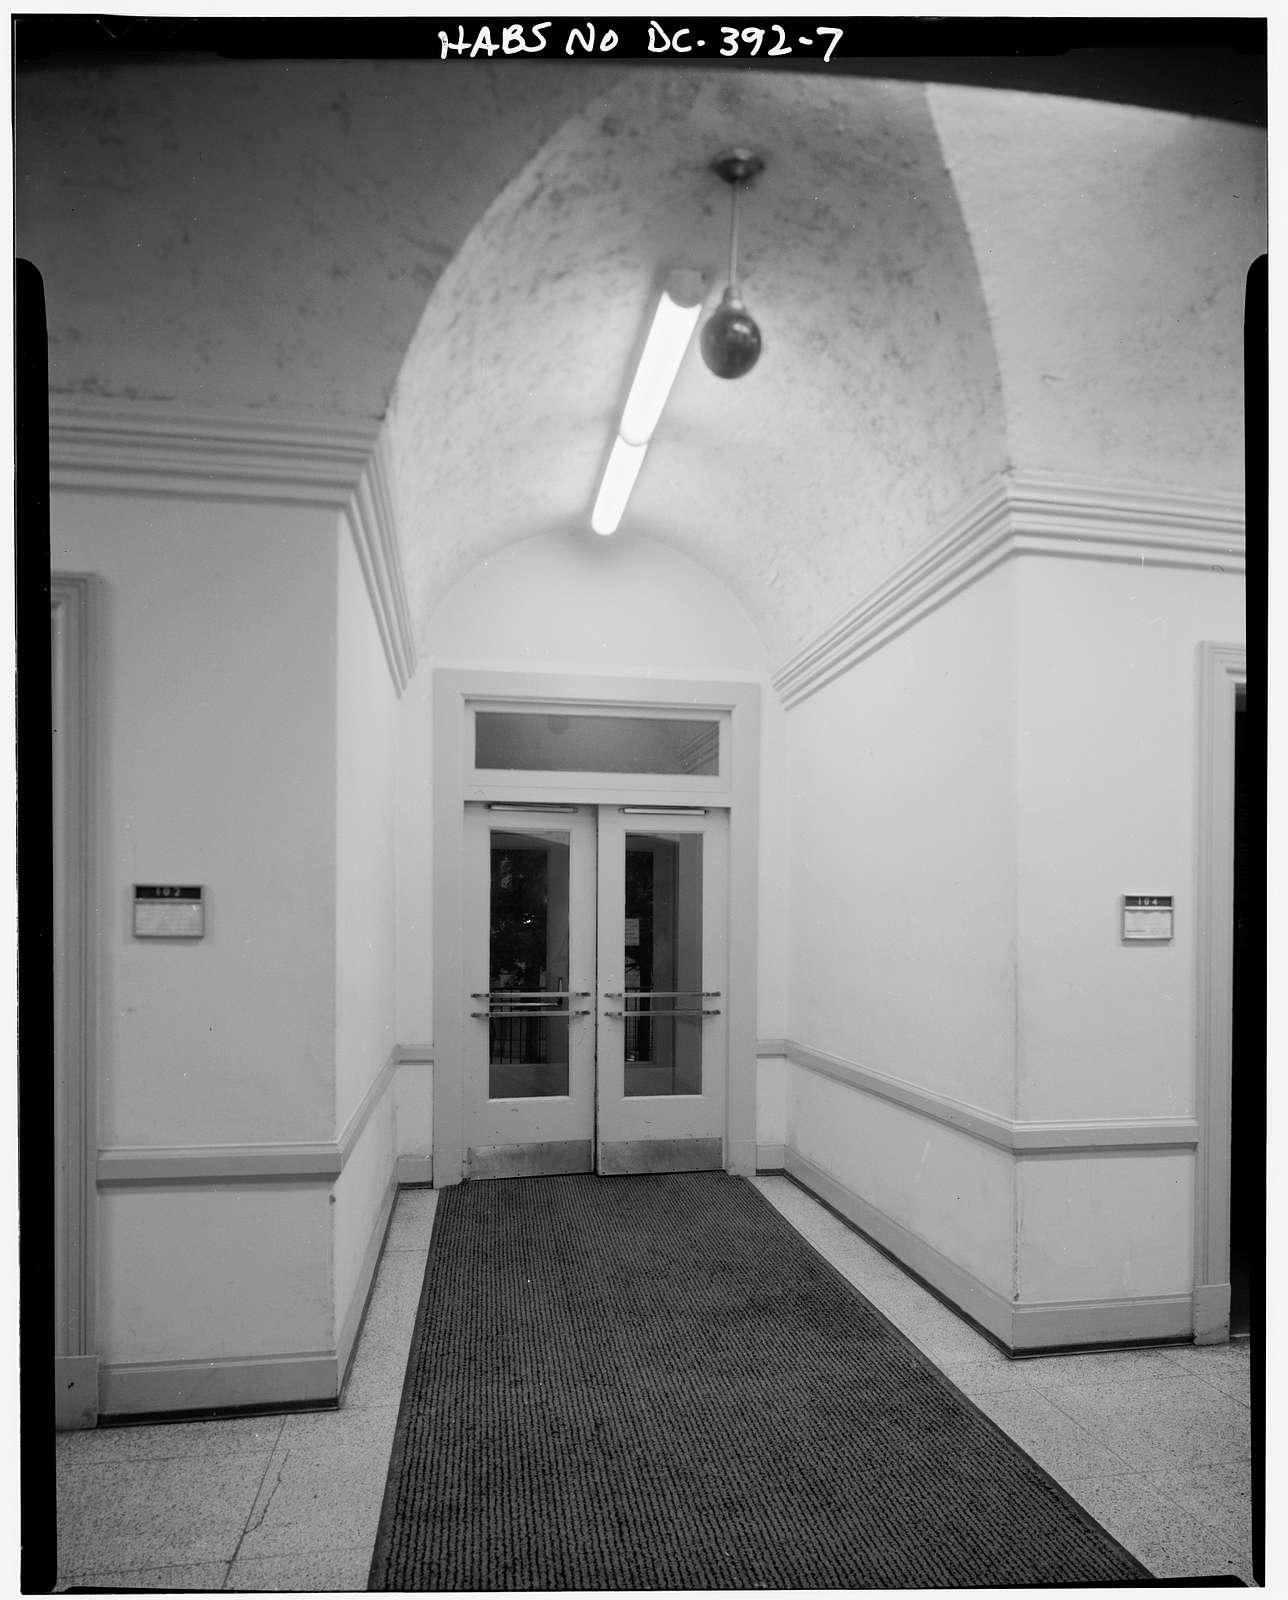 Winder Building, Seventeenth & F Streets, Northwest, Washington, District of Columbia, DC